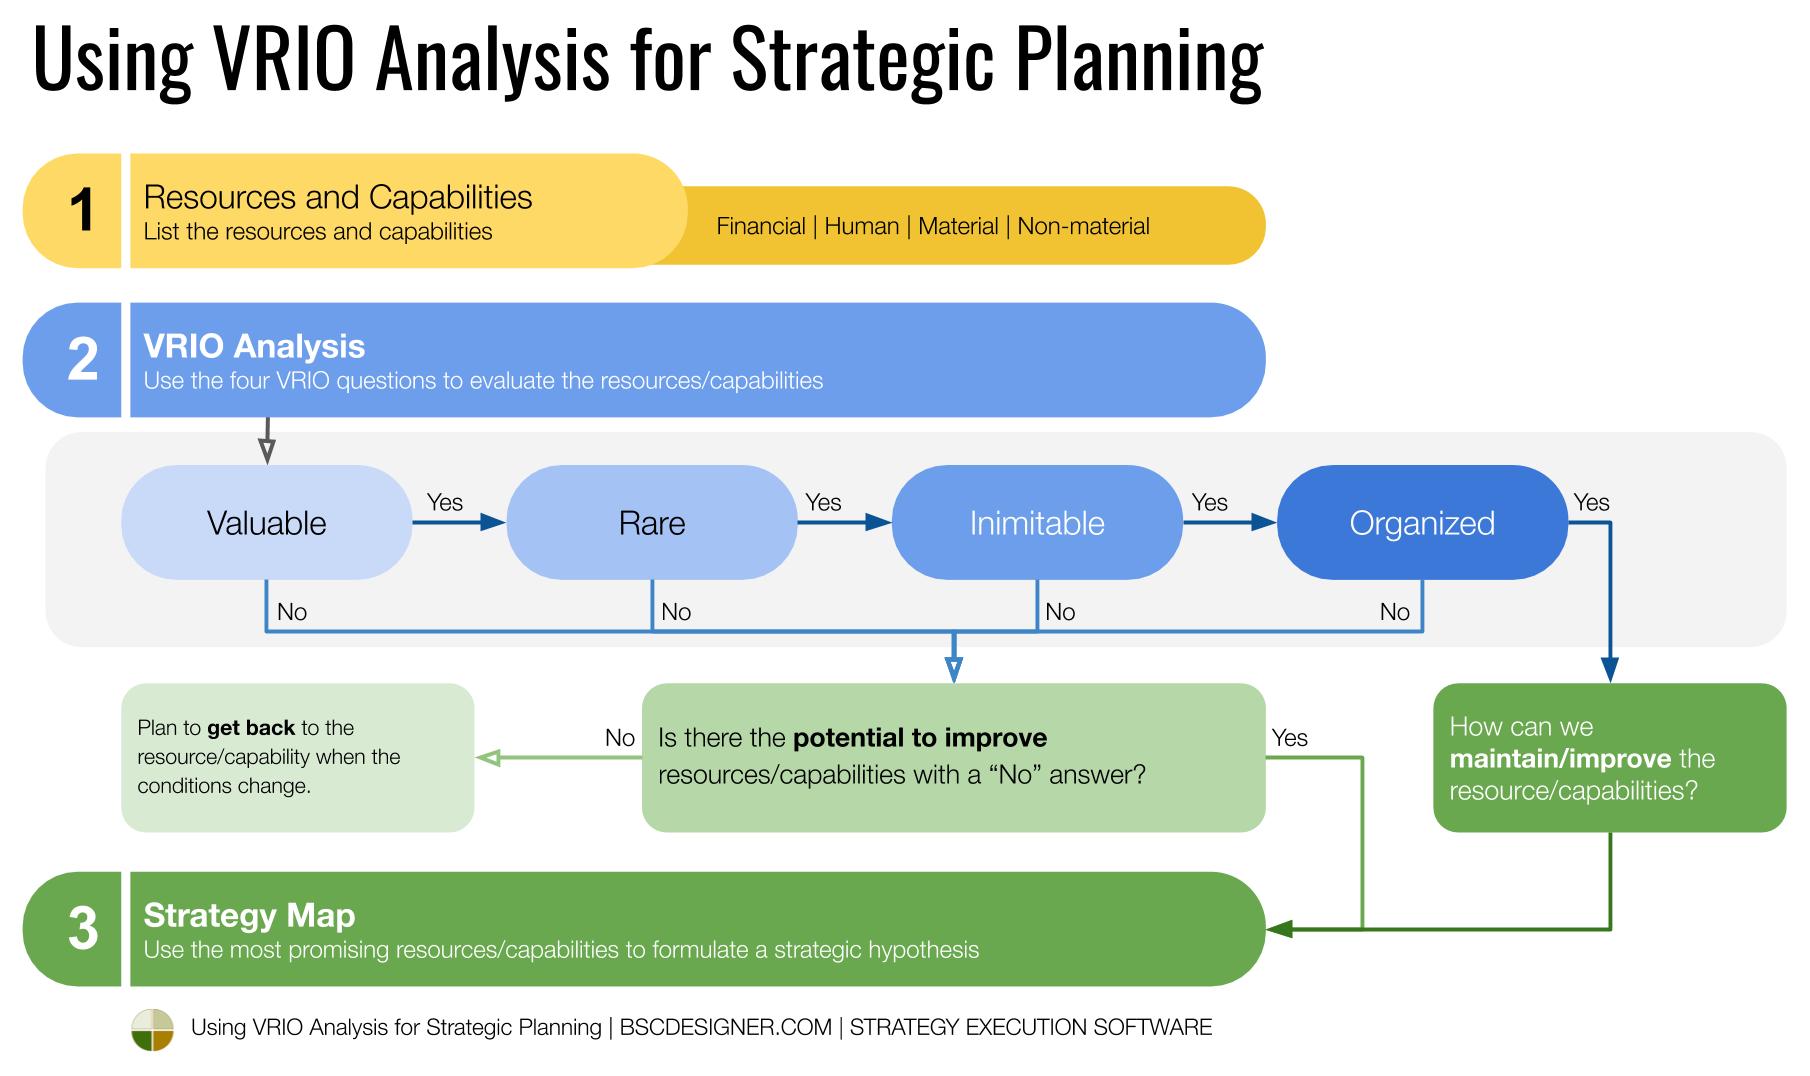 Using VRIO for strategic planning